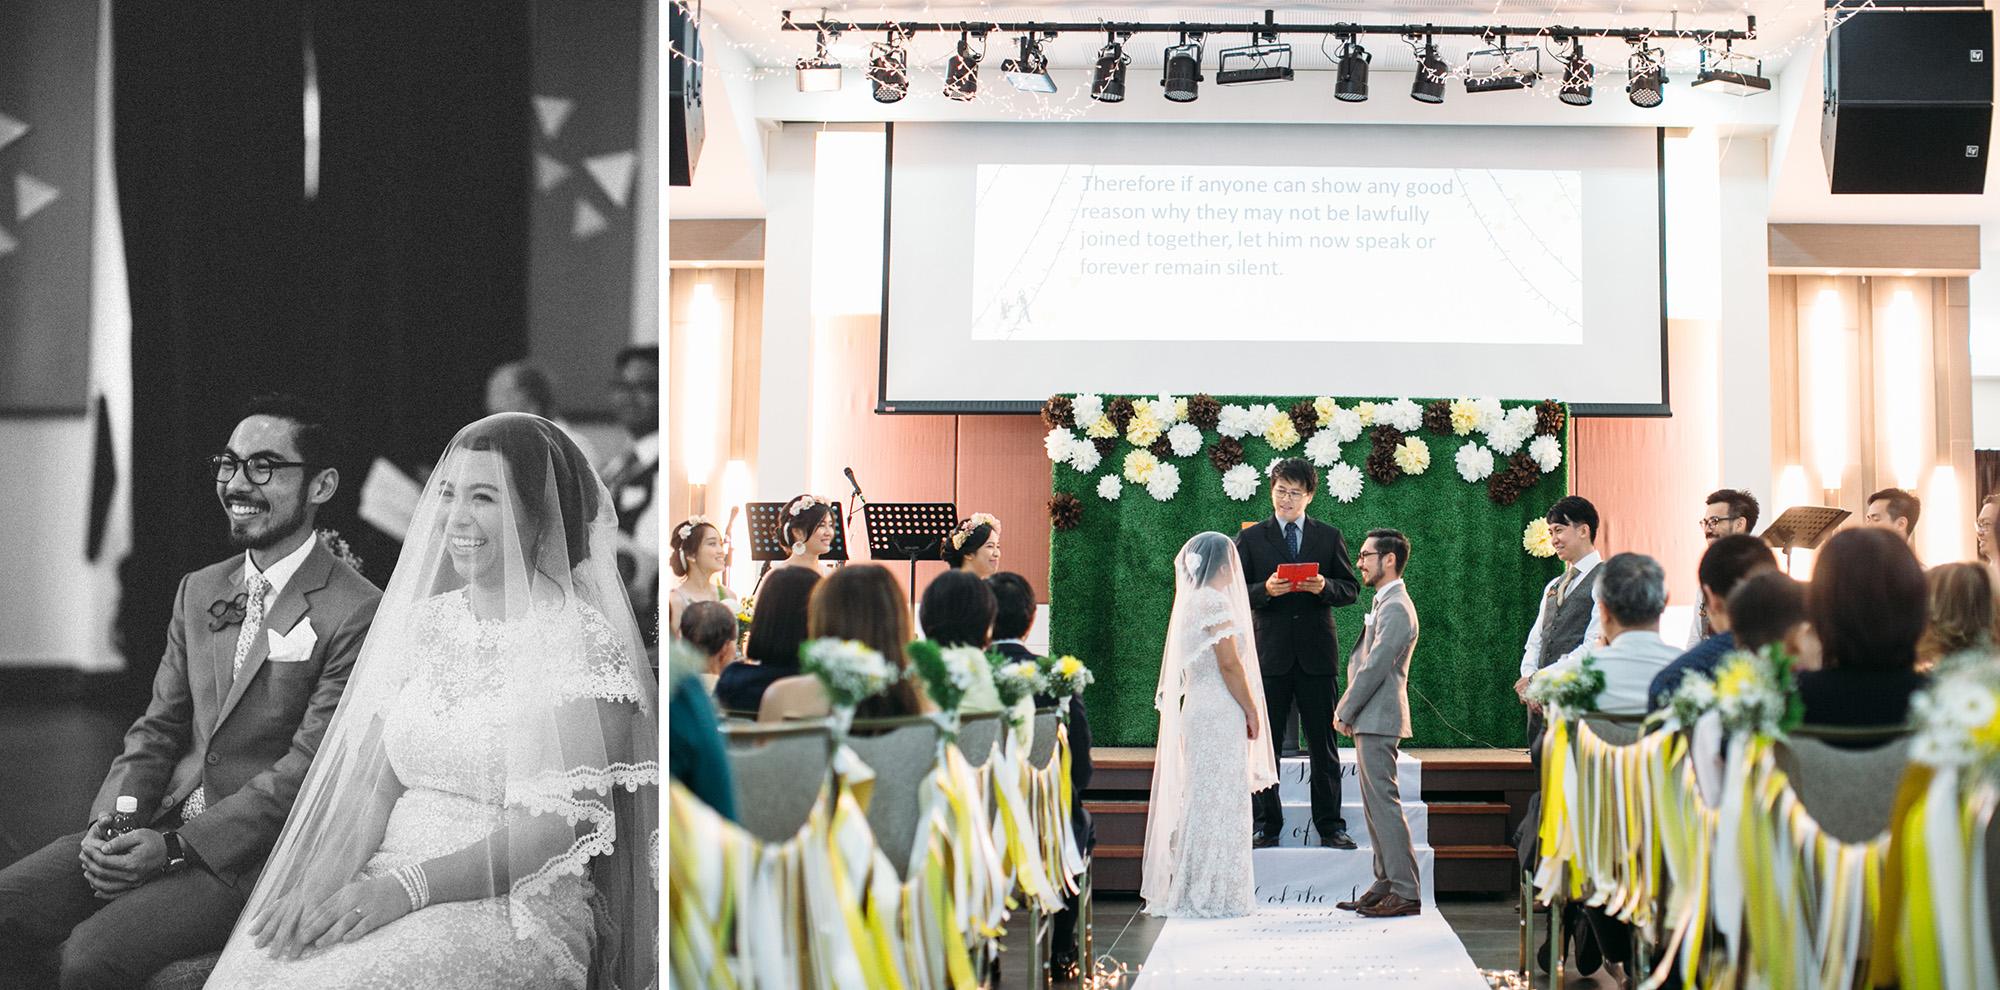 51-hellojanelee-sam grace-malaysia-wedding-day